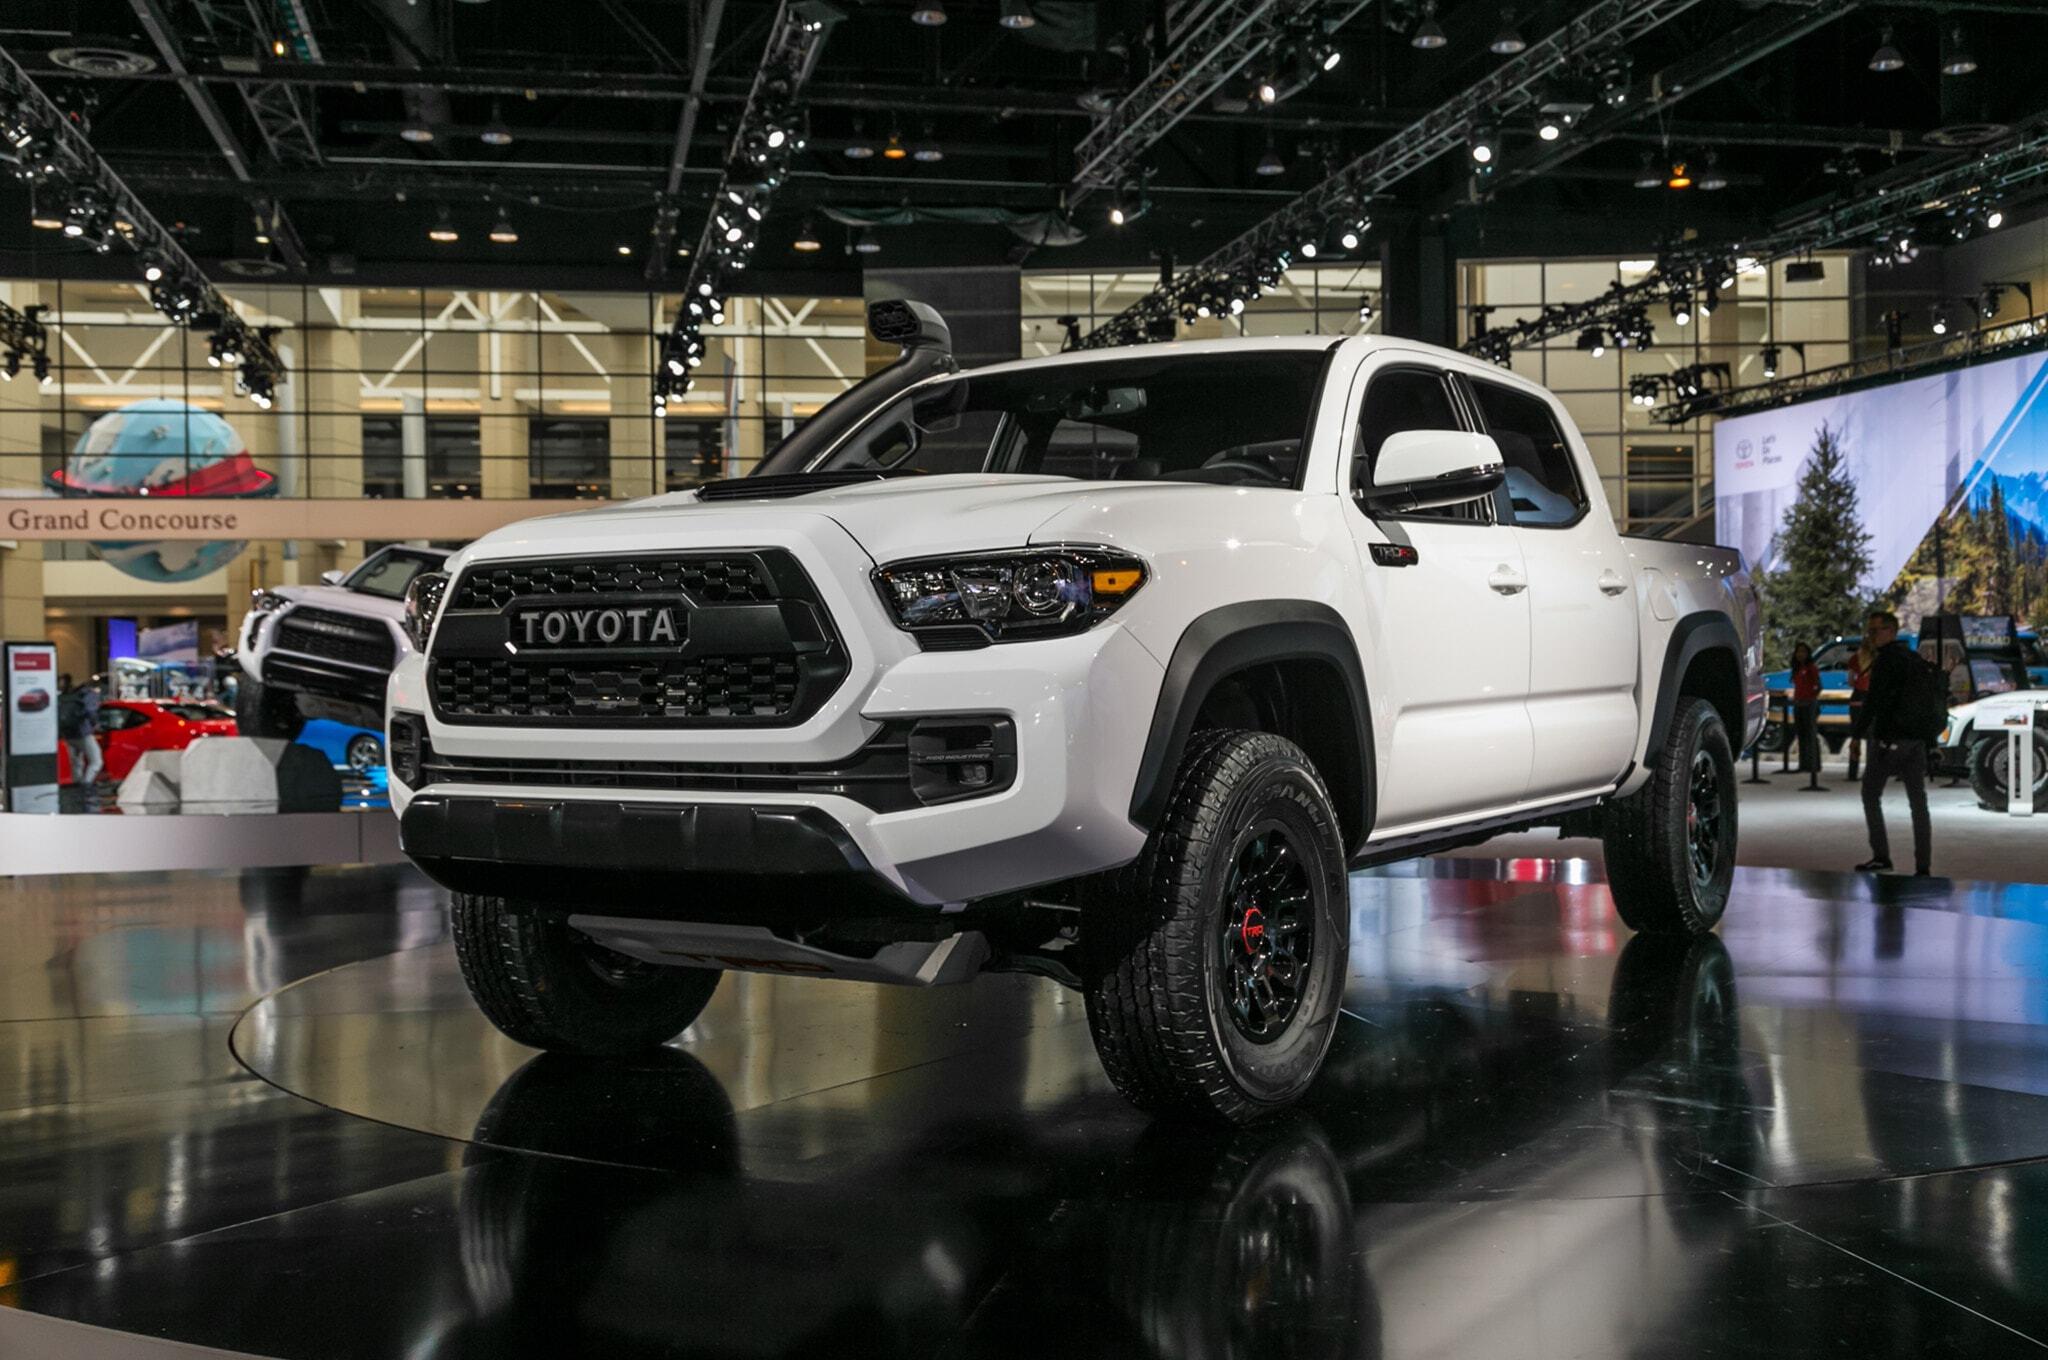 2019-Toyota-Tacoma-TRD-Pro-front-three-quarter-02-1